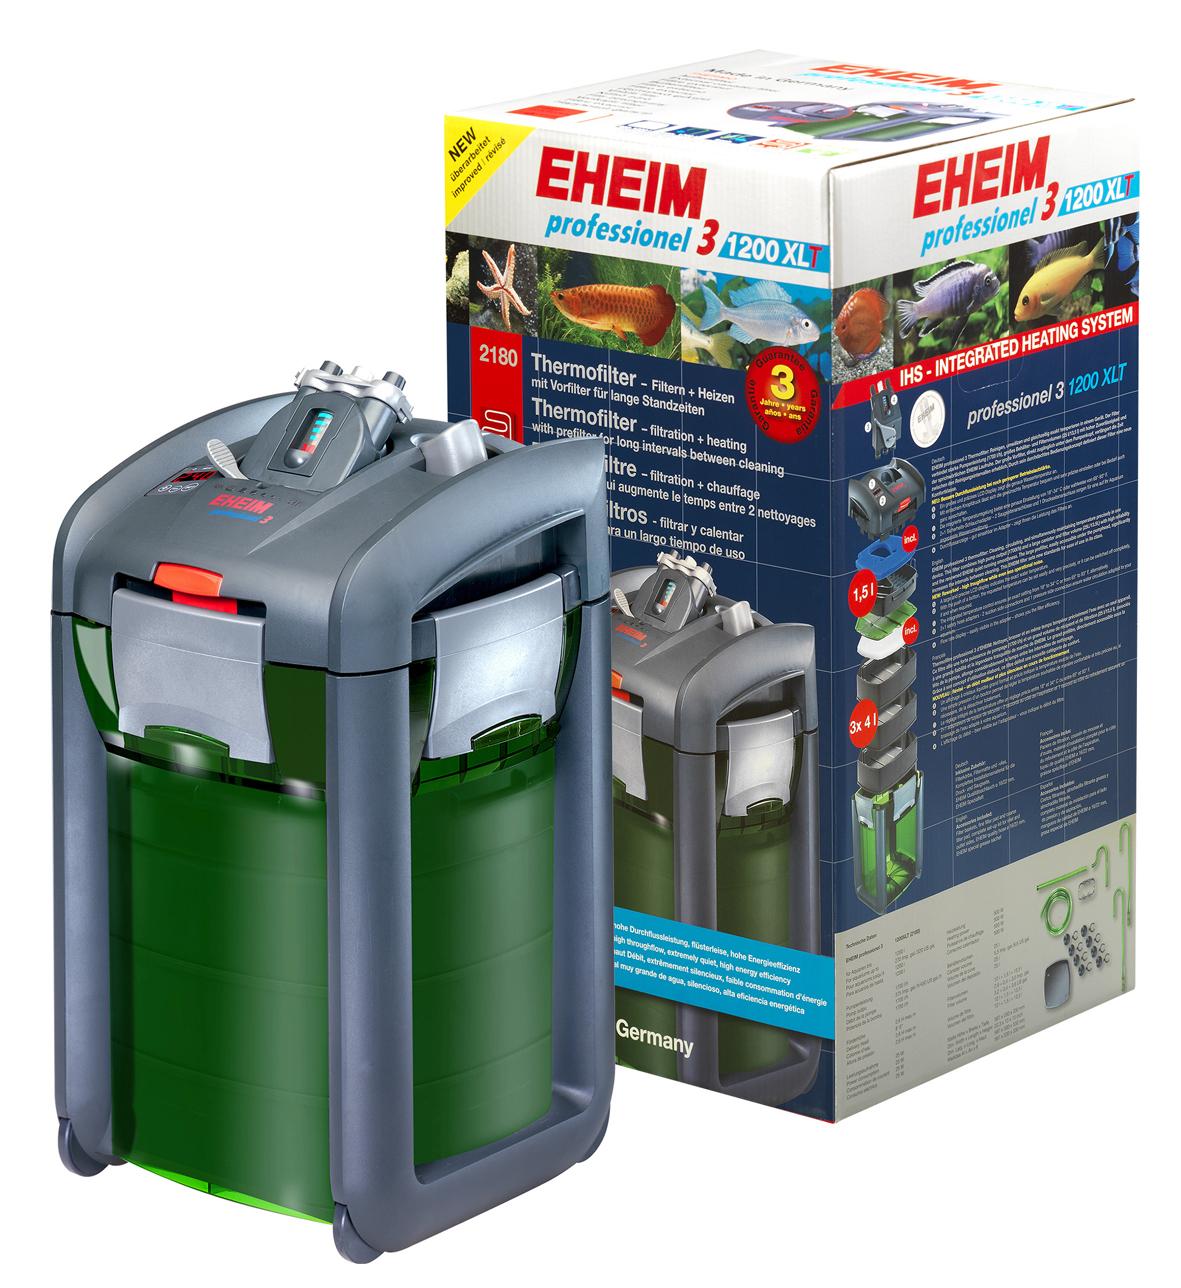 EHEIM professionel 3 Thermofilter